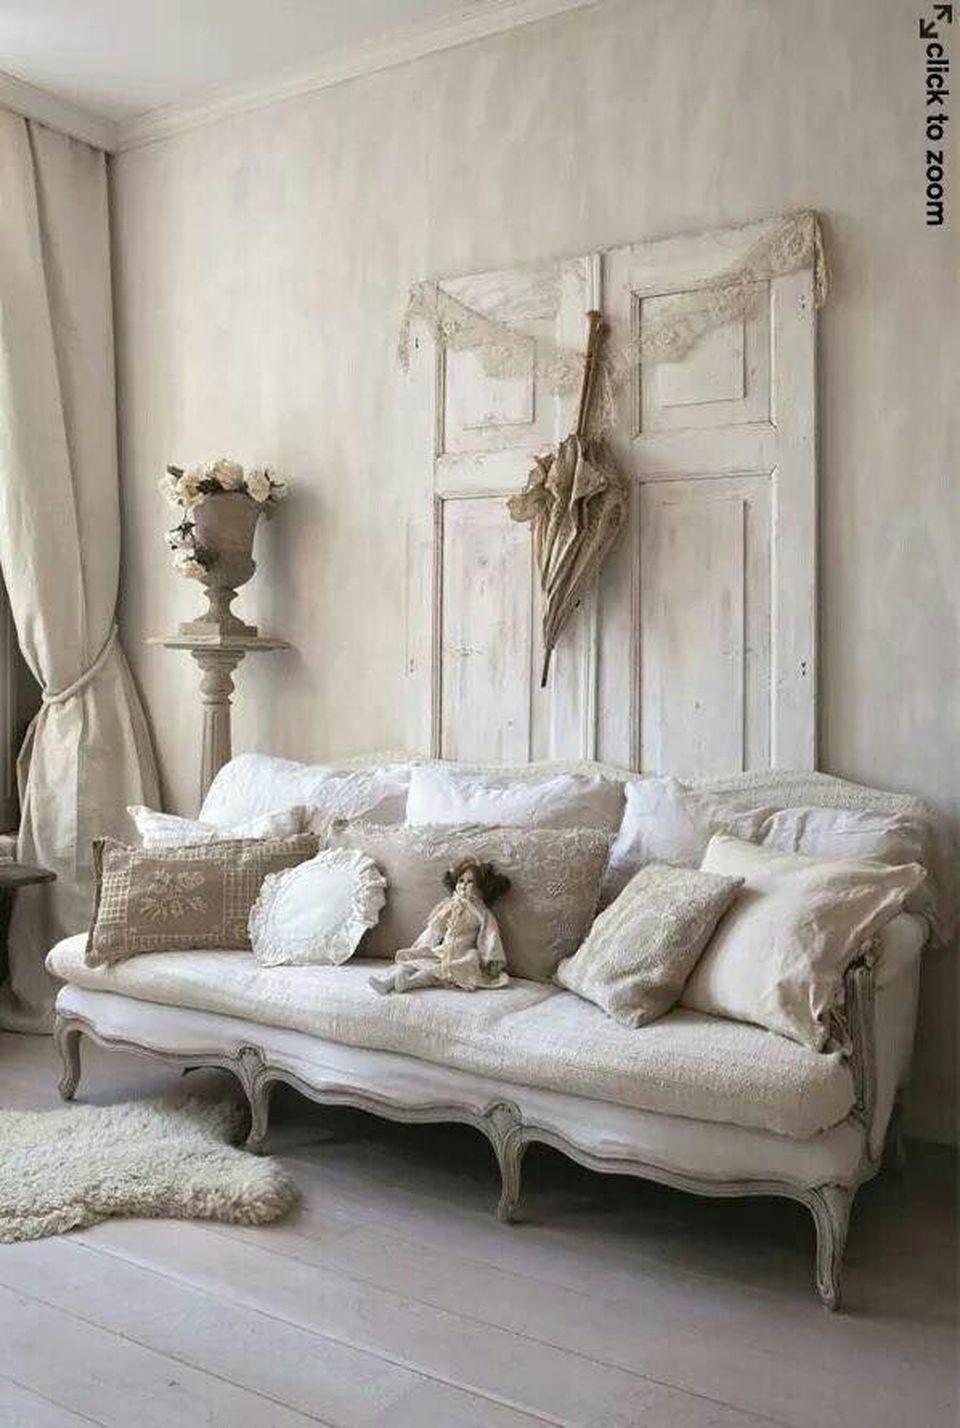 70 Vintage Shabby Chic Living Room Decorations Ideas  Shabby Chic Entrancing Chic Living Room Designs Design Inspiration